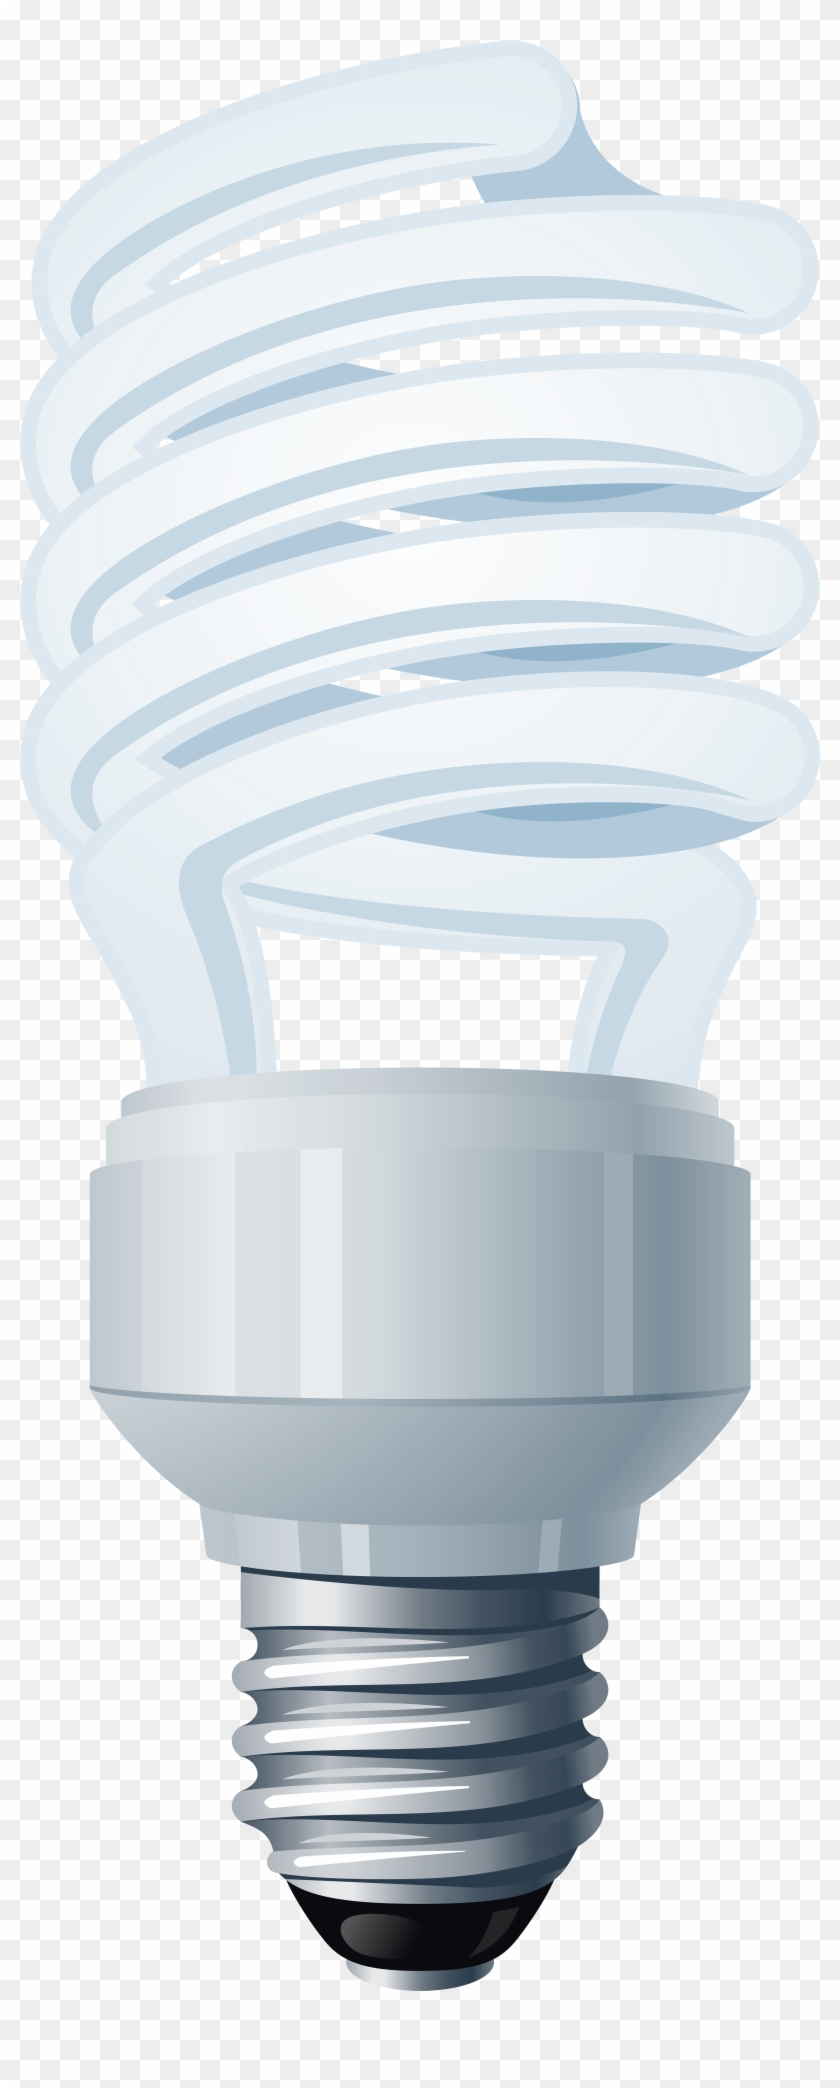 Energy Saving Compact Fluorescent Light Firework Displays Incandescent Bulb Diagram Cyberphysics The Electric Clip Art Lamp